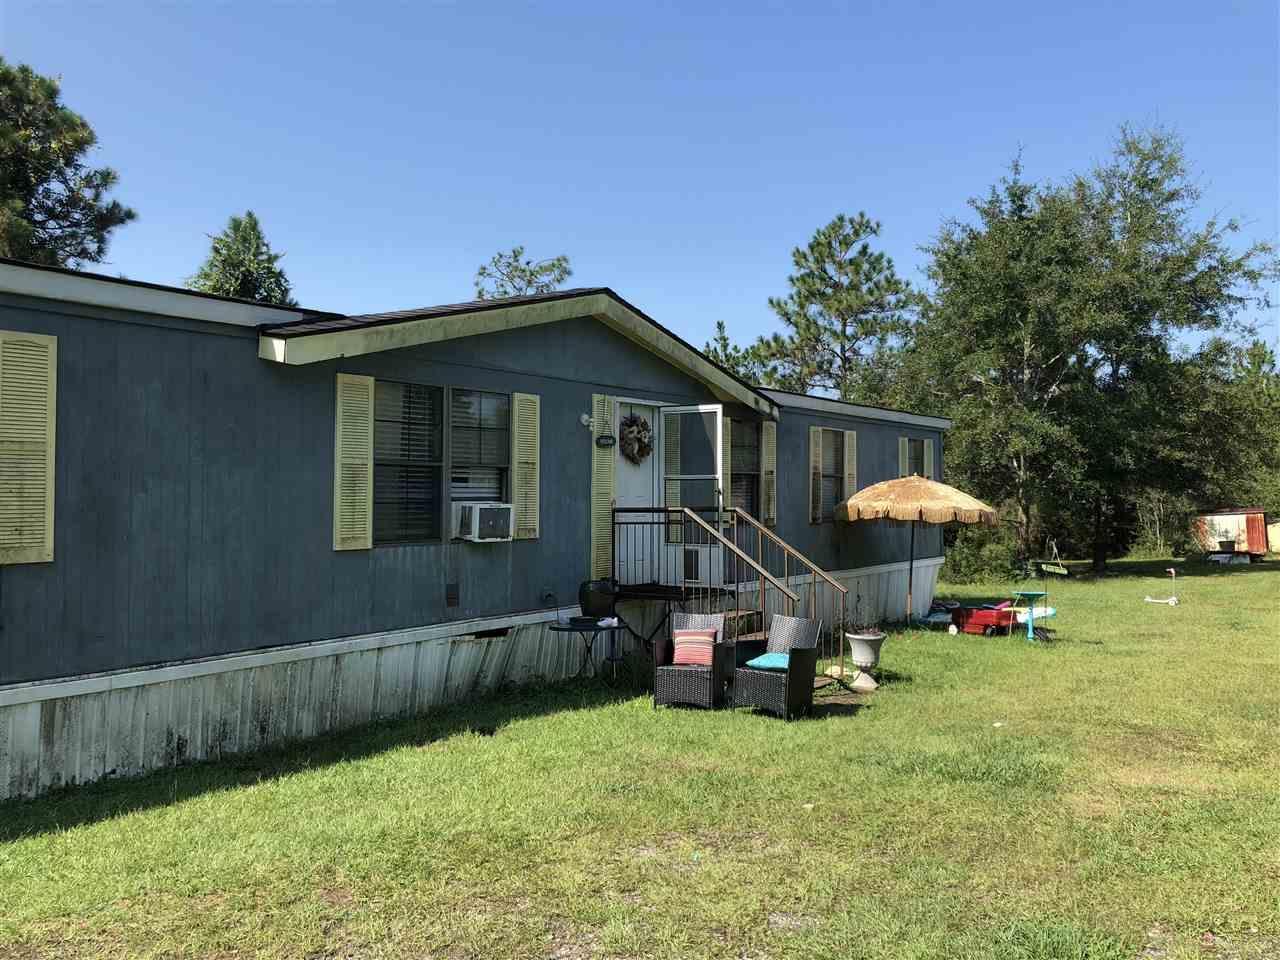 19345 Vaughn Rd, Seminole, AL 36574